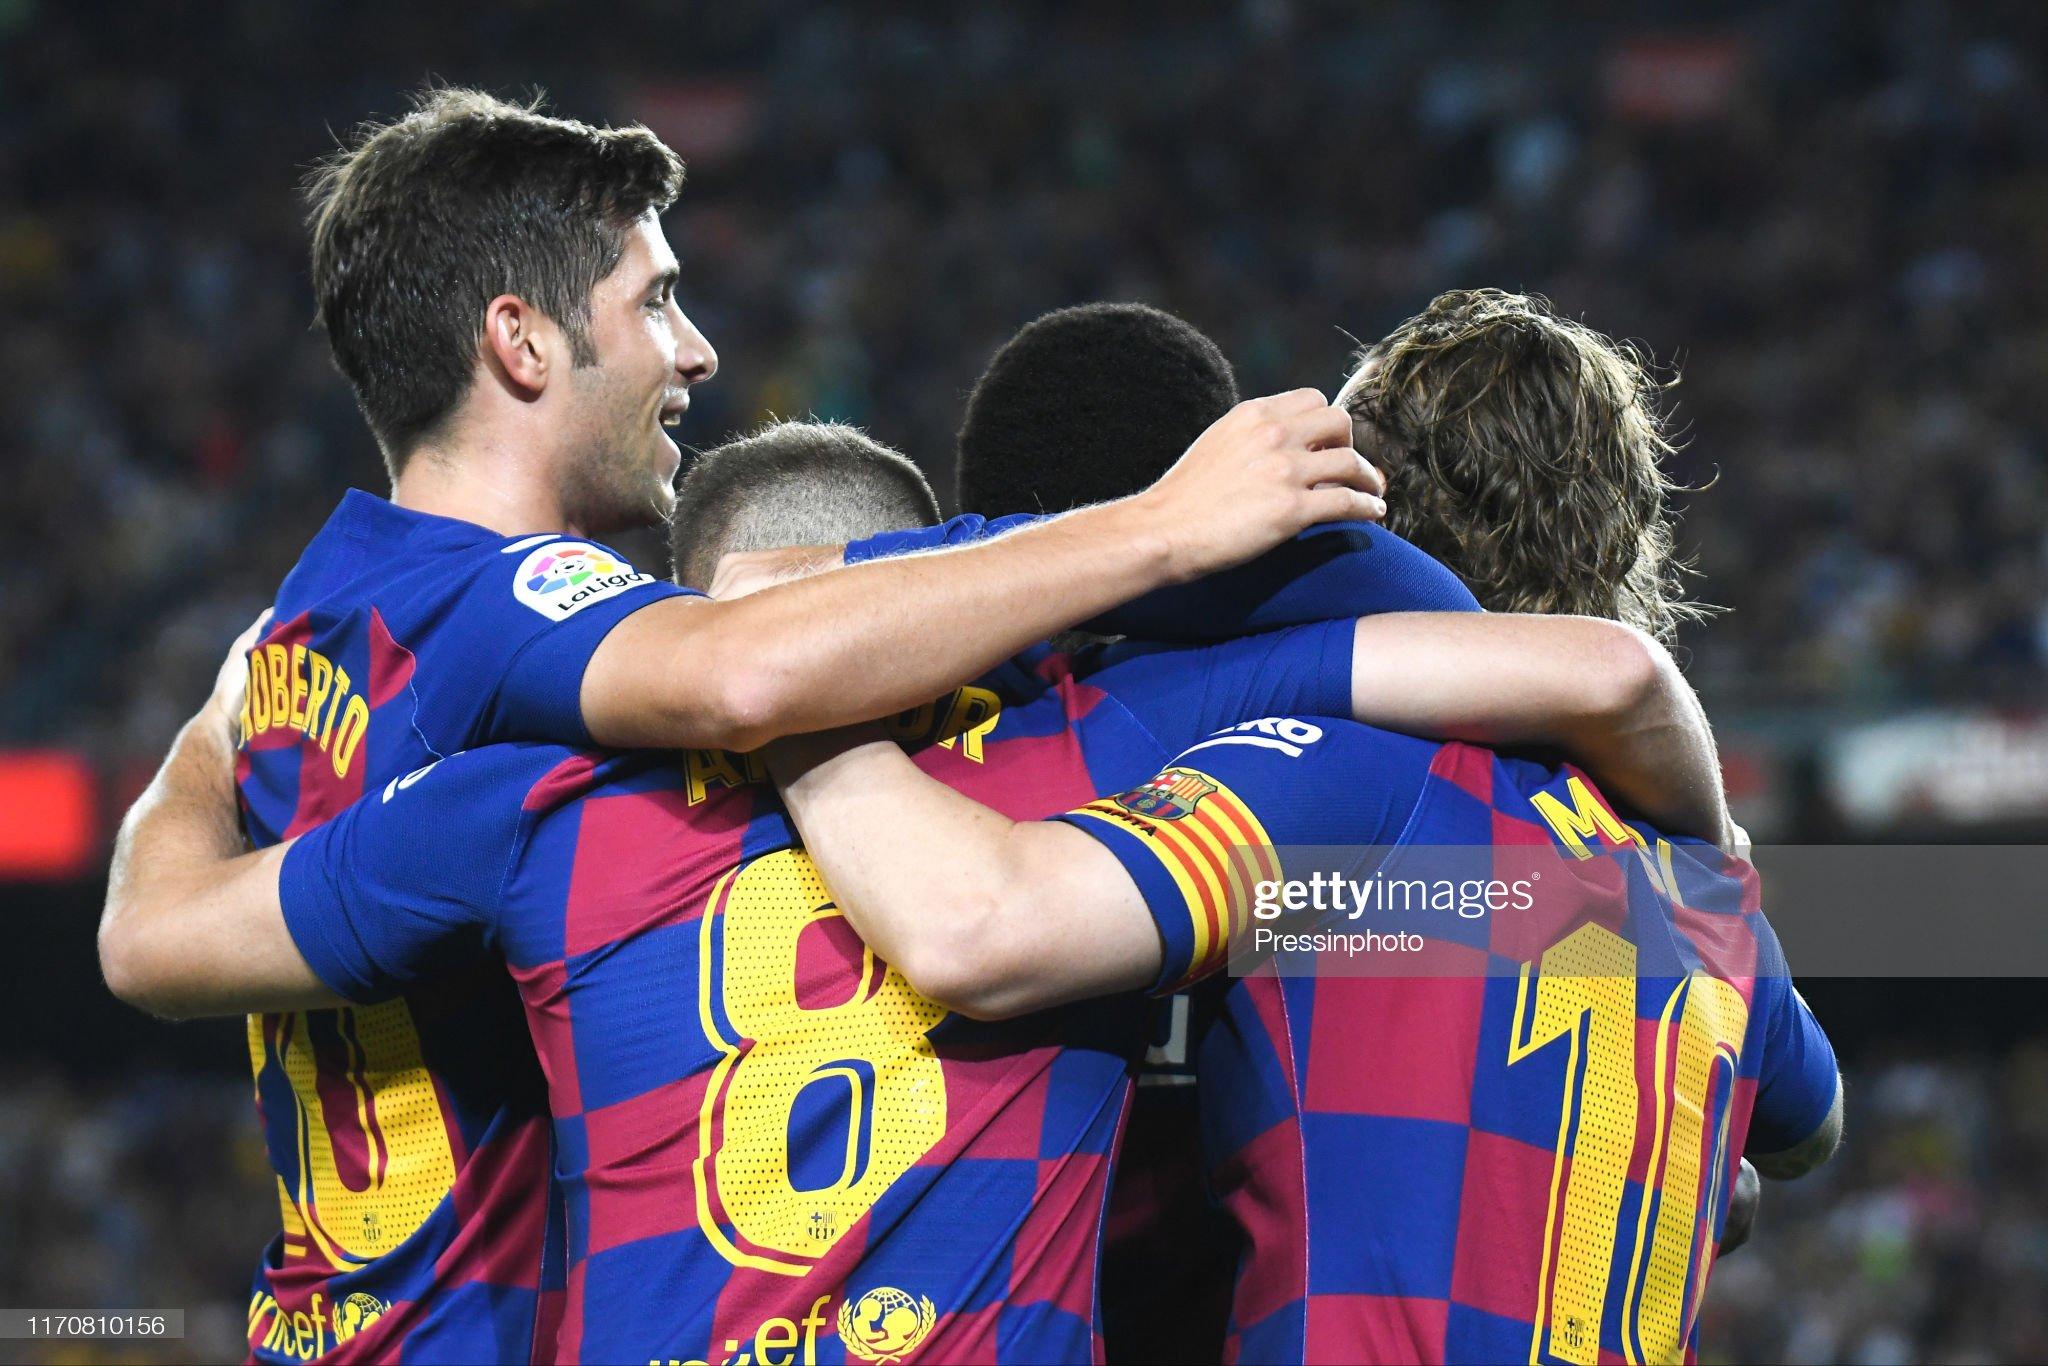 صور مباراة : برشلونة - فياريال 2-1 ( 24-09-2019 )  Antoine-griezmann-of-fc-barcelona-celebrates-his-goal-with-his-the-picture-id1170810156?s=2048x2048